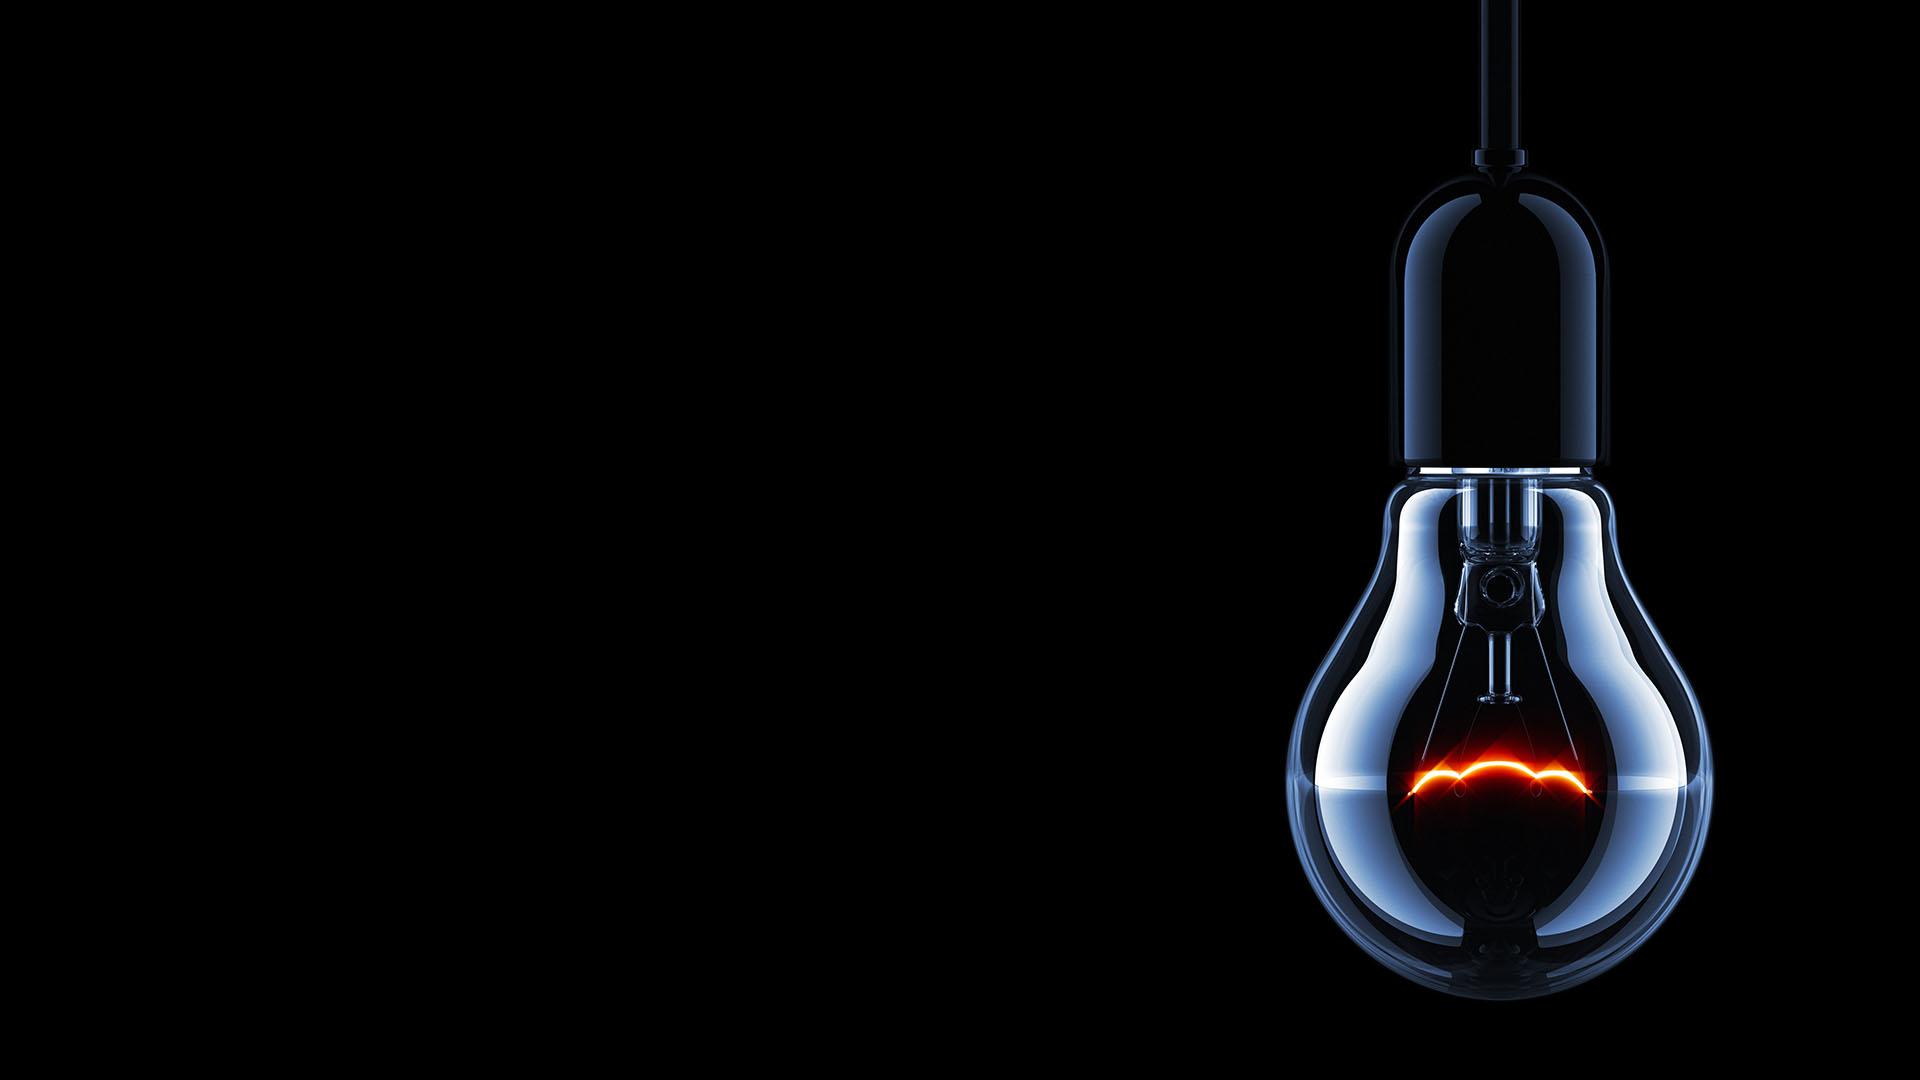 download reflection cs dl bulb srgb pexels creative photography bright free bulbs illuminated light stock photo